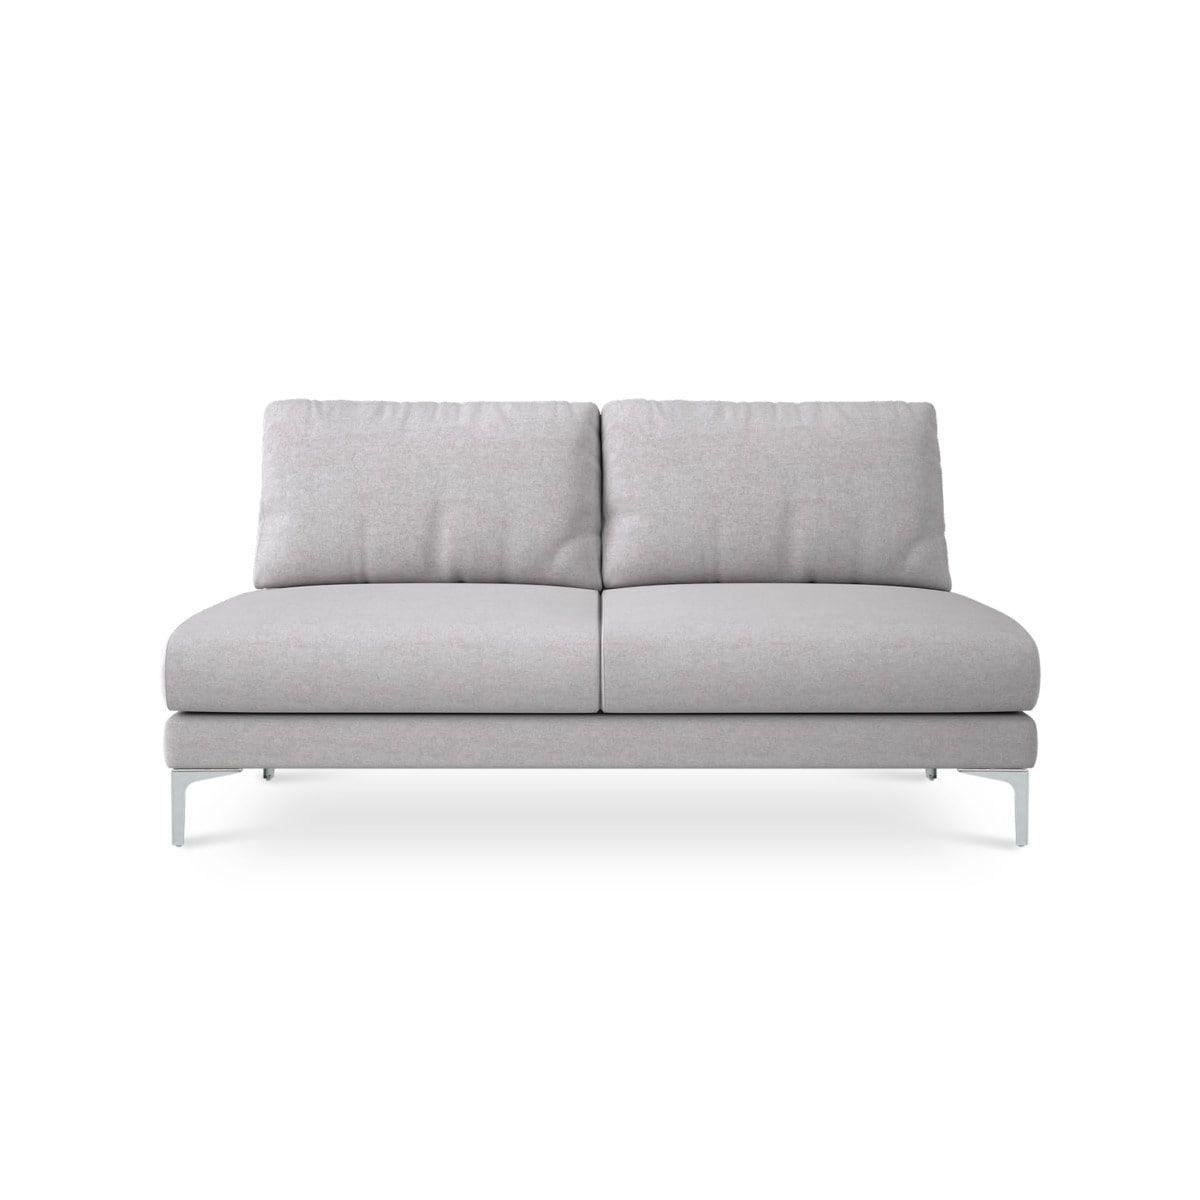 Adams Armless 2 Seater Sofa Modern Gray Fabric Modular Loveseat